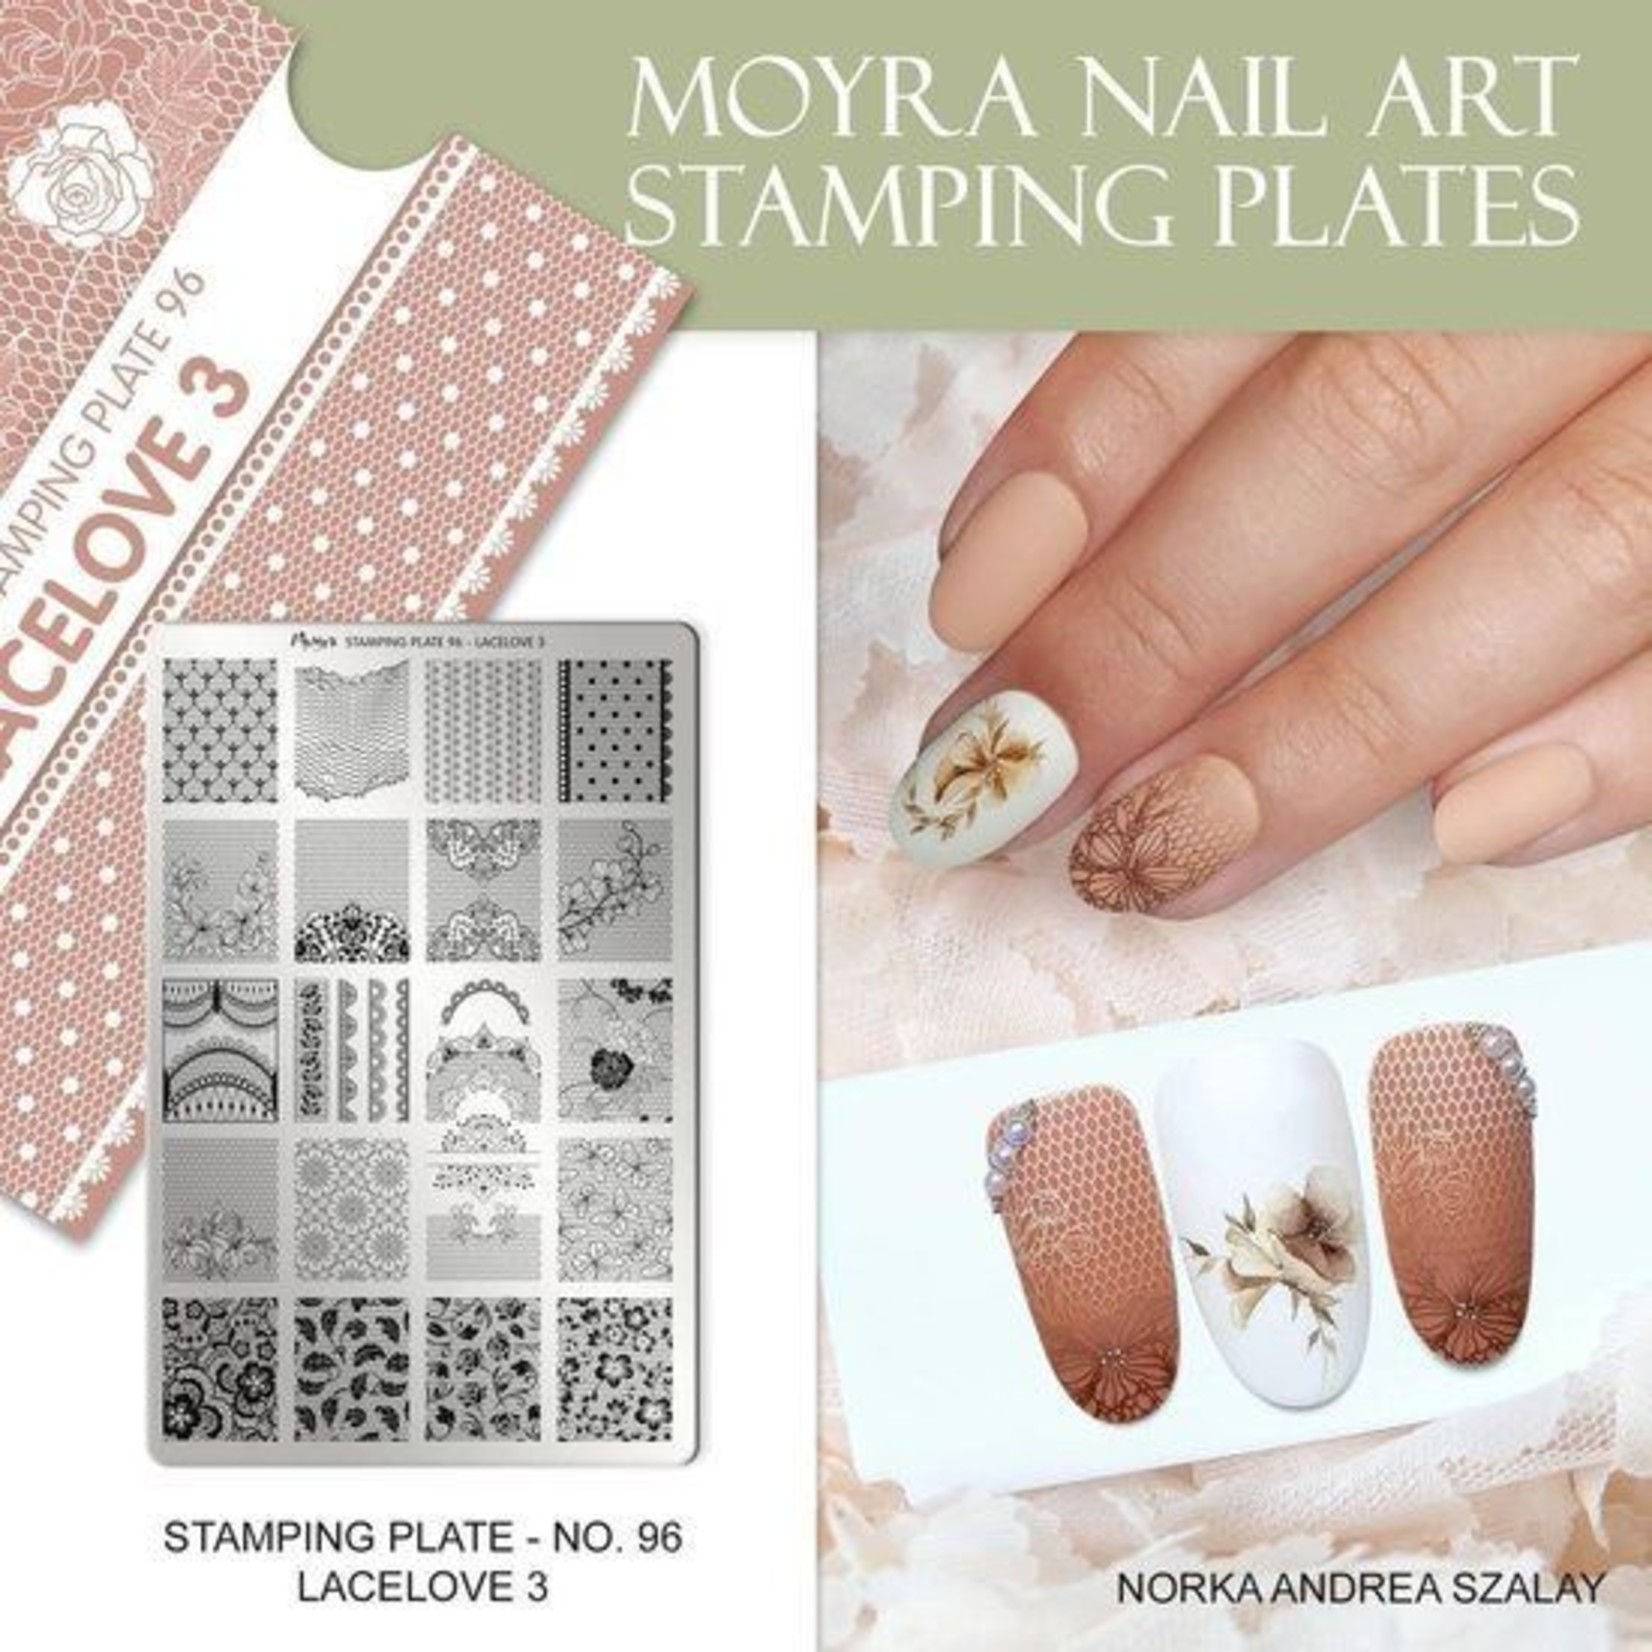 Moyra Moyra Stamping plate 96 Lacelove 3